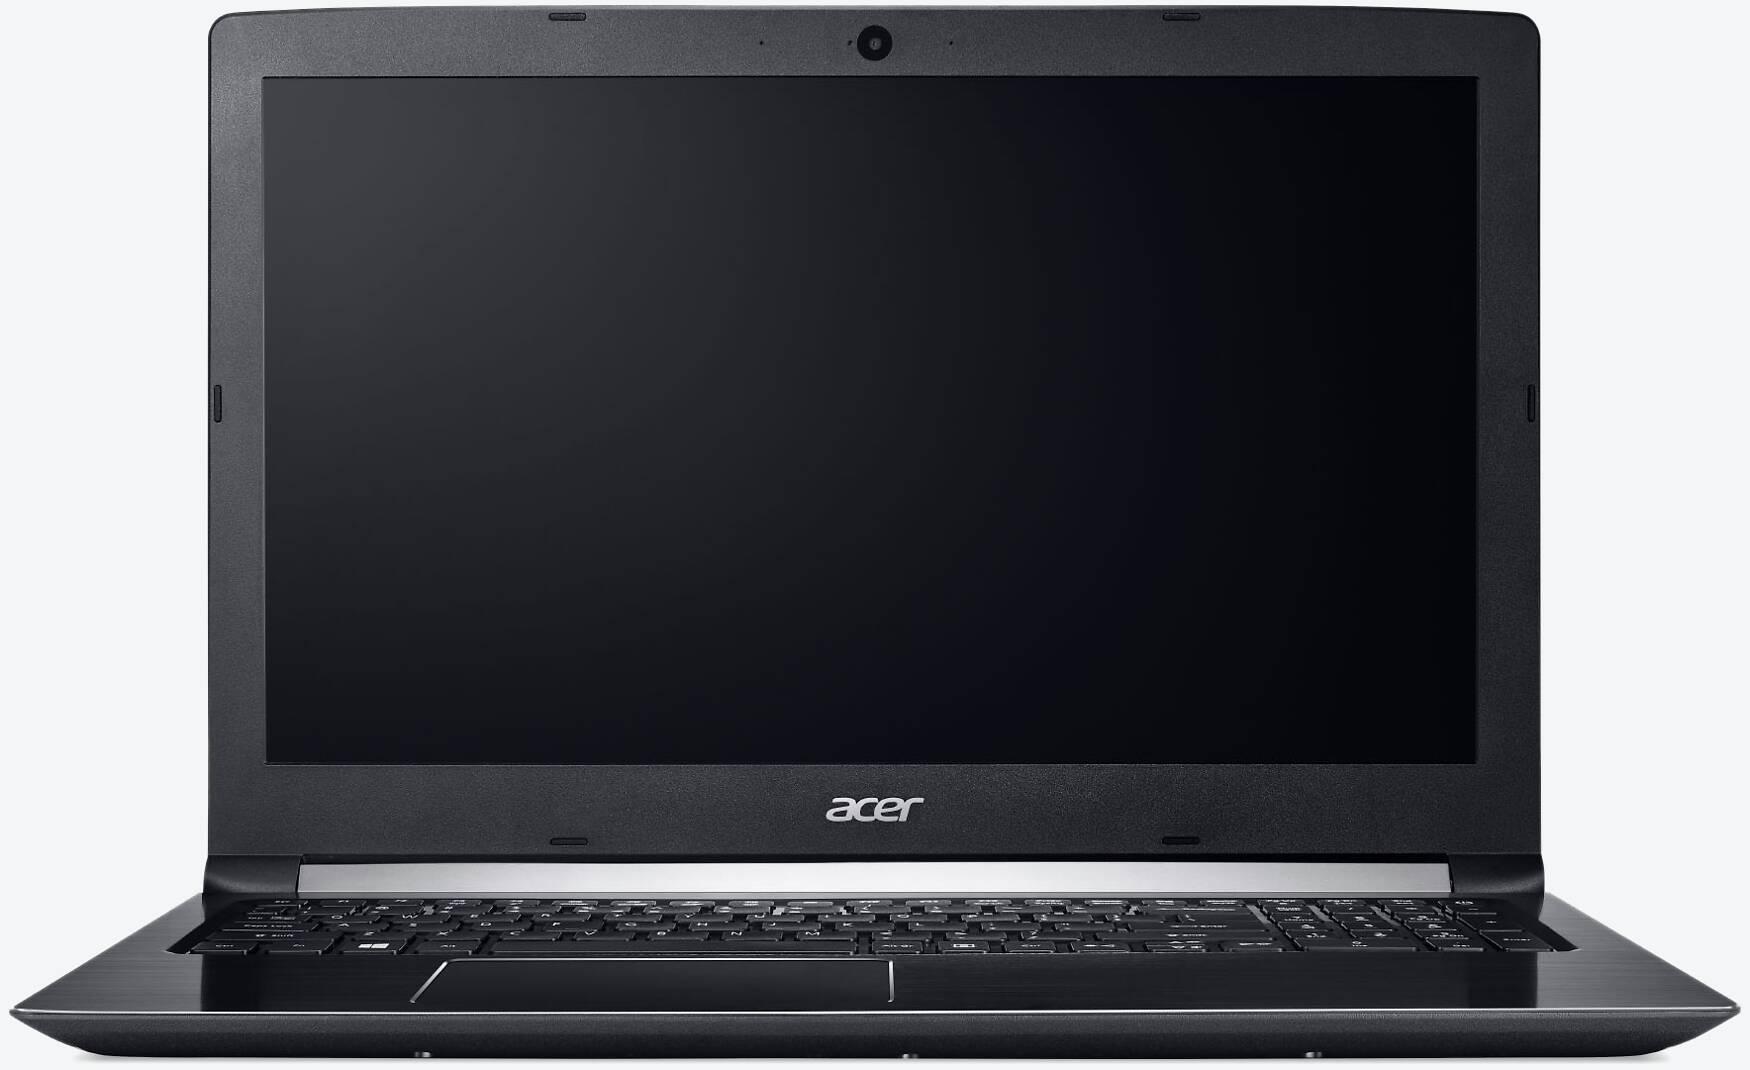 Acer Aspire 5 A517-51-56HA